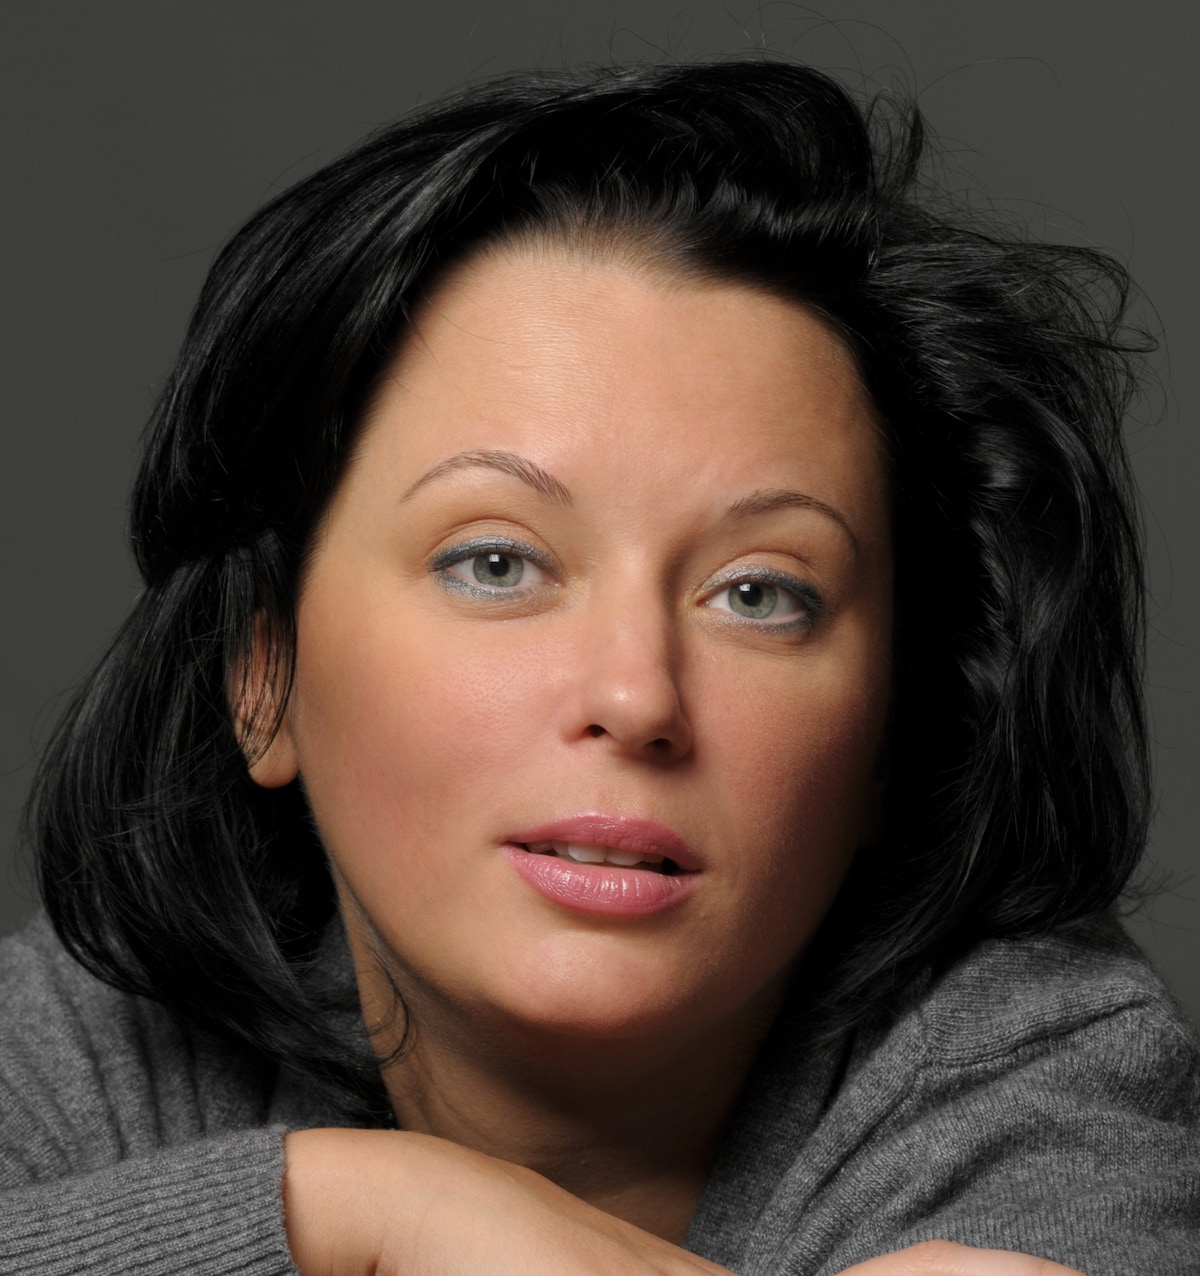 Ольга from Moskva